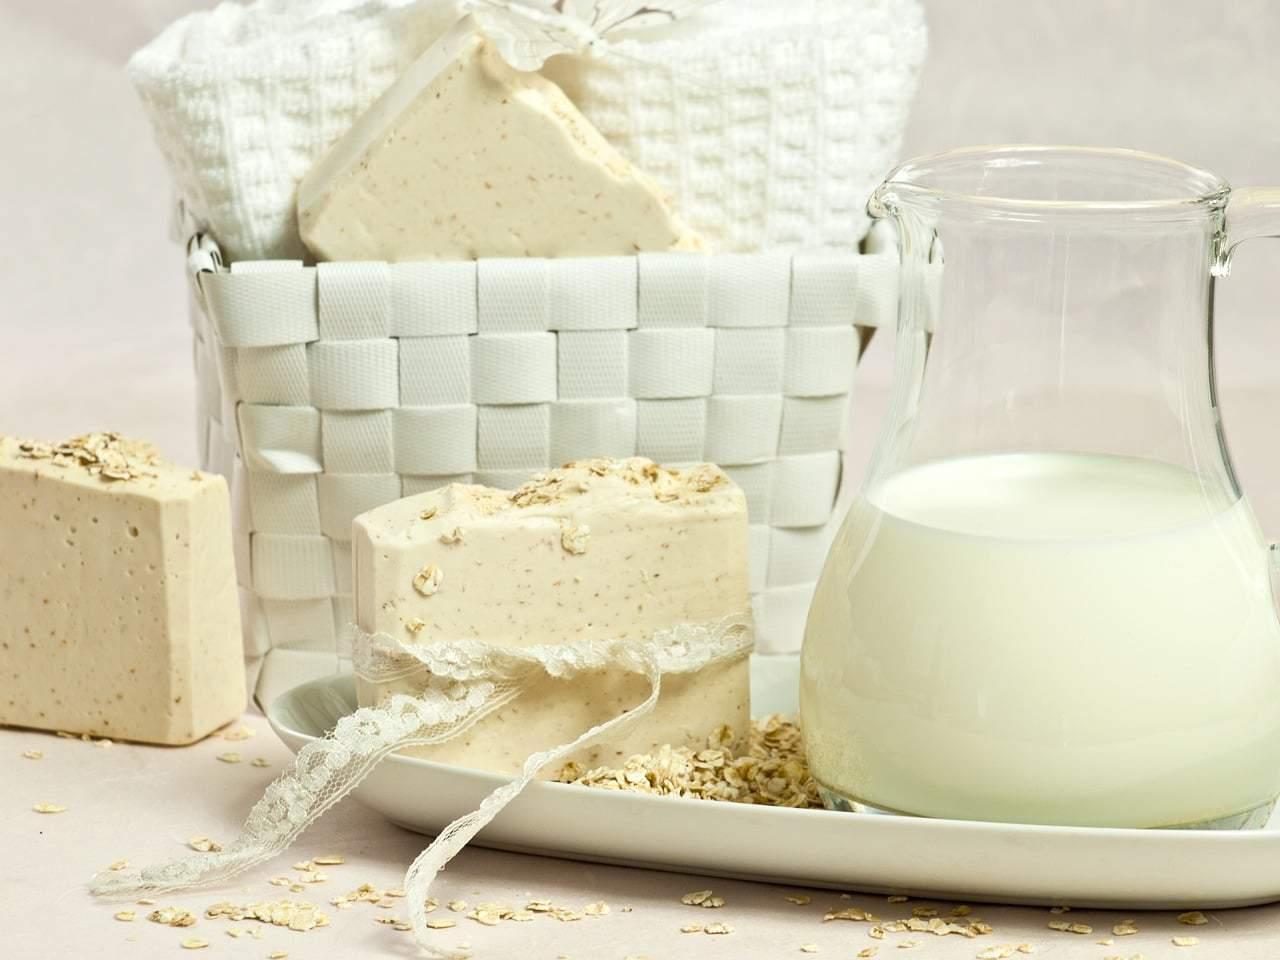 DIY Peppermint + Oatmeal Bath